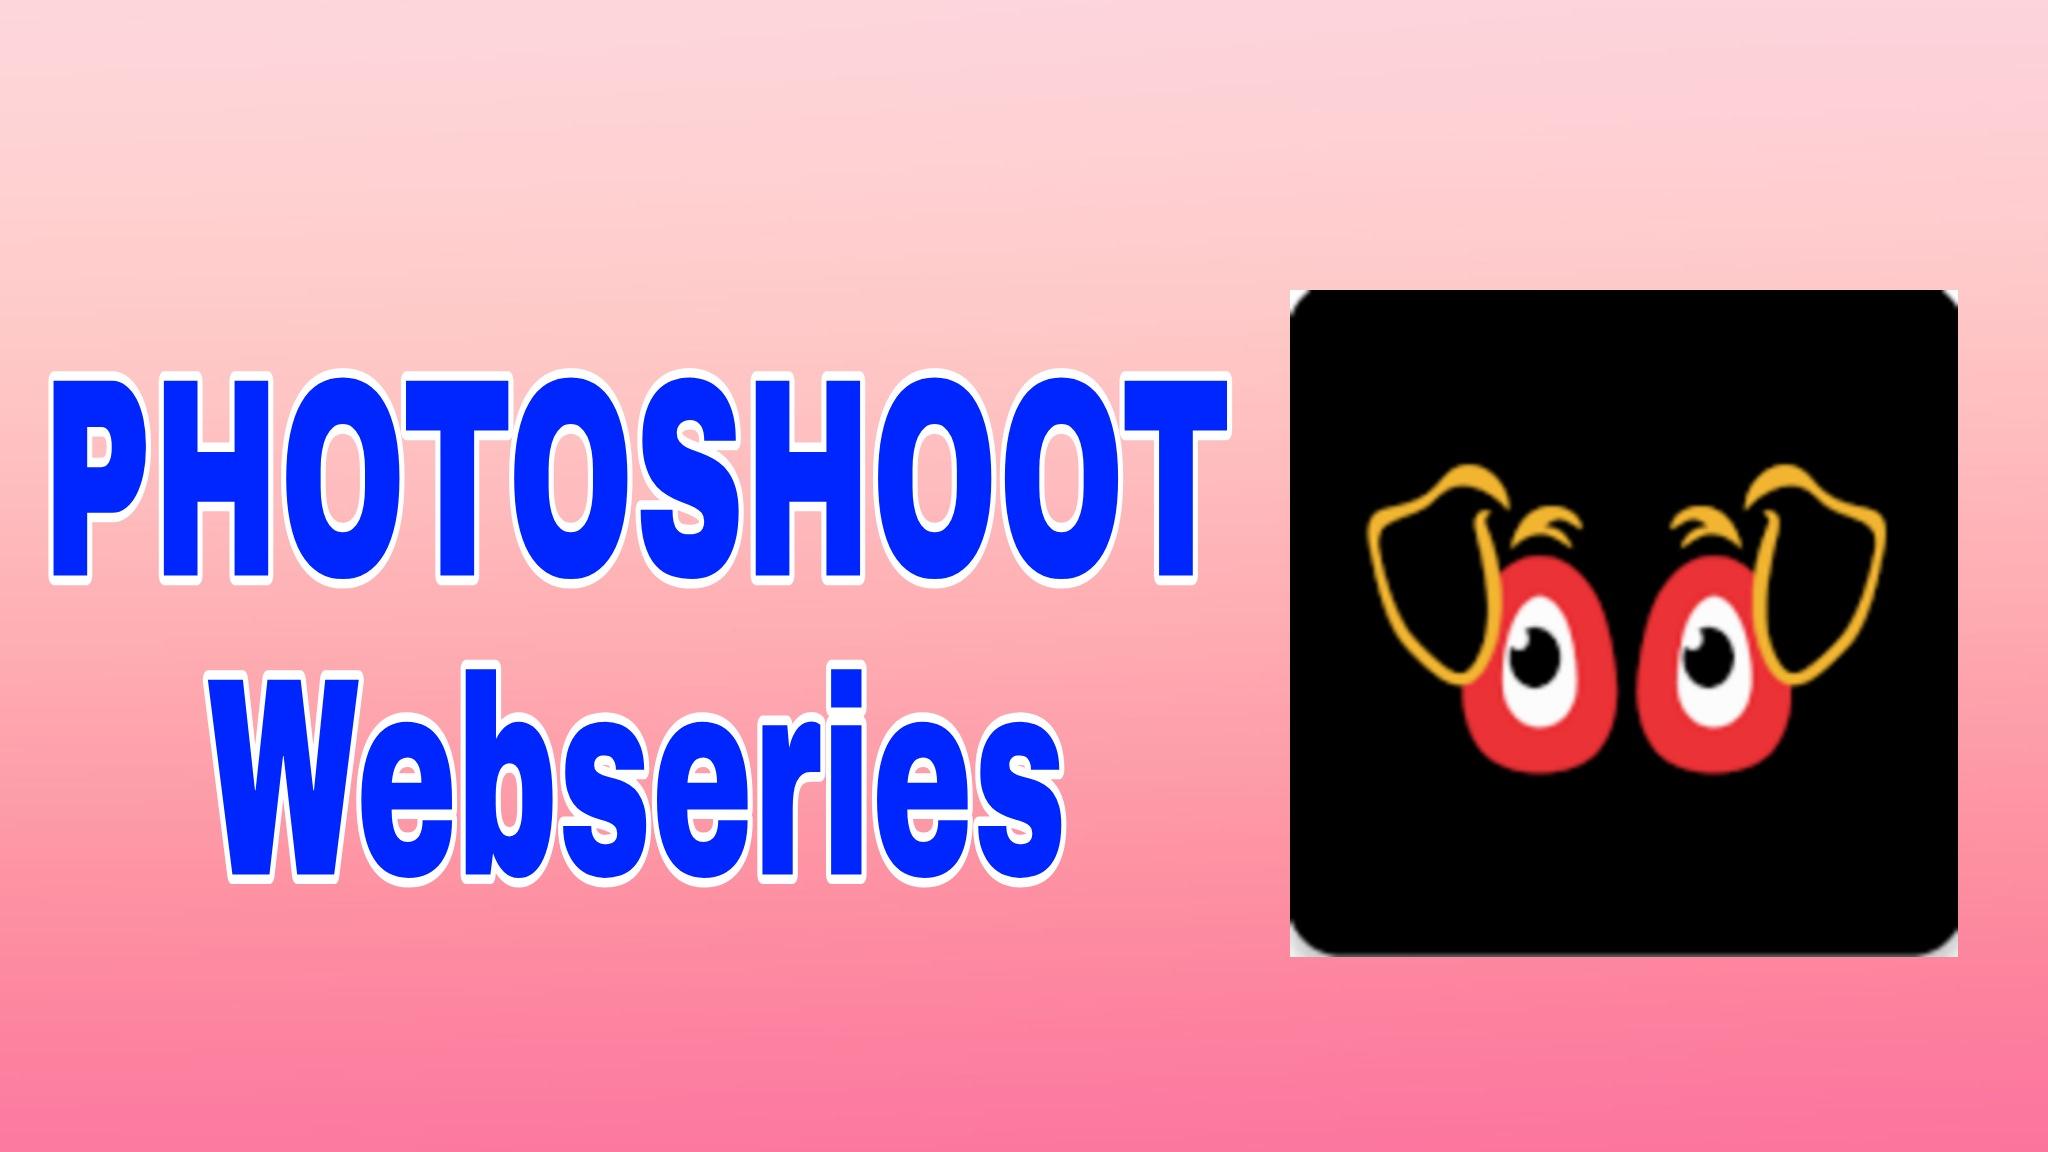 PHOTOSHOOT Webseries